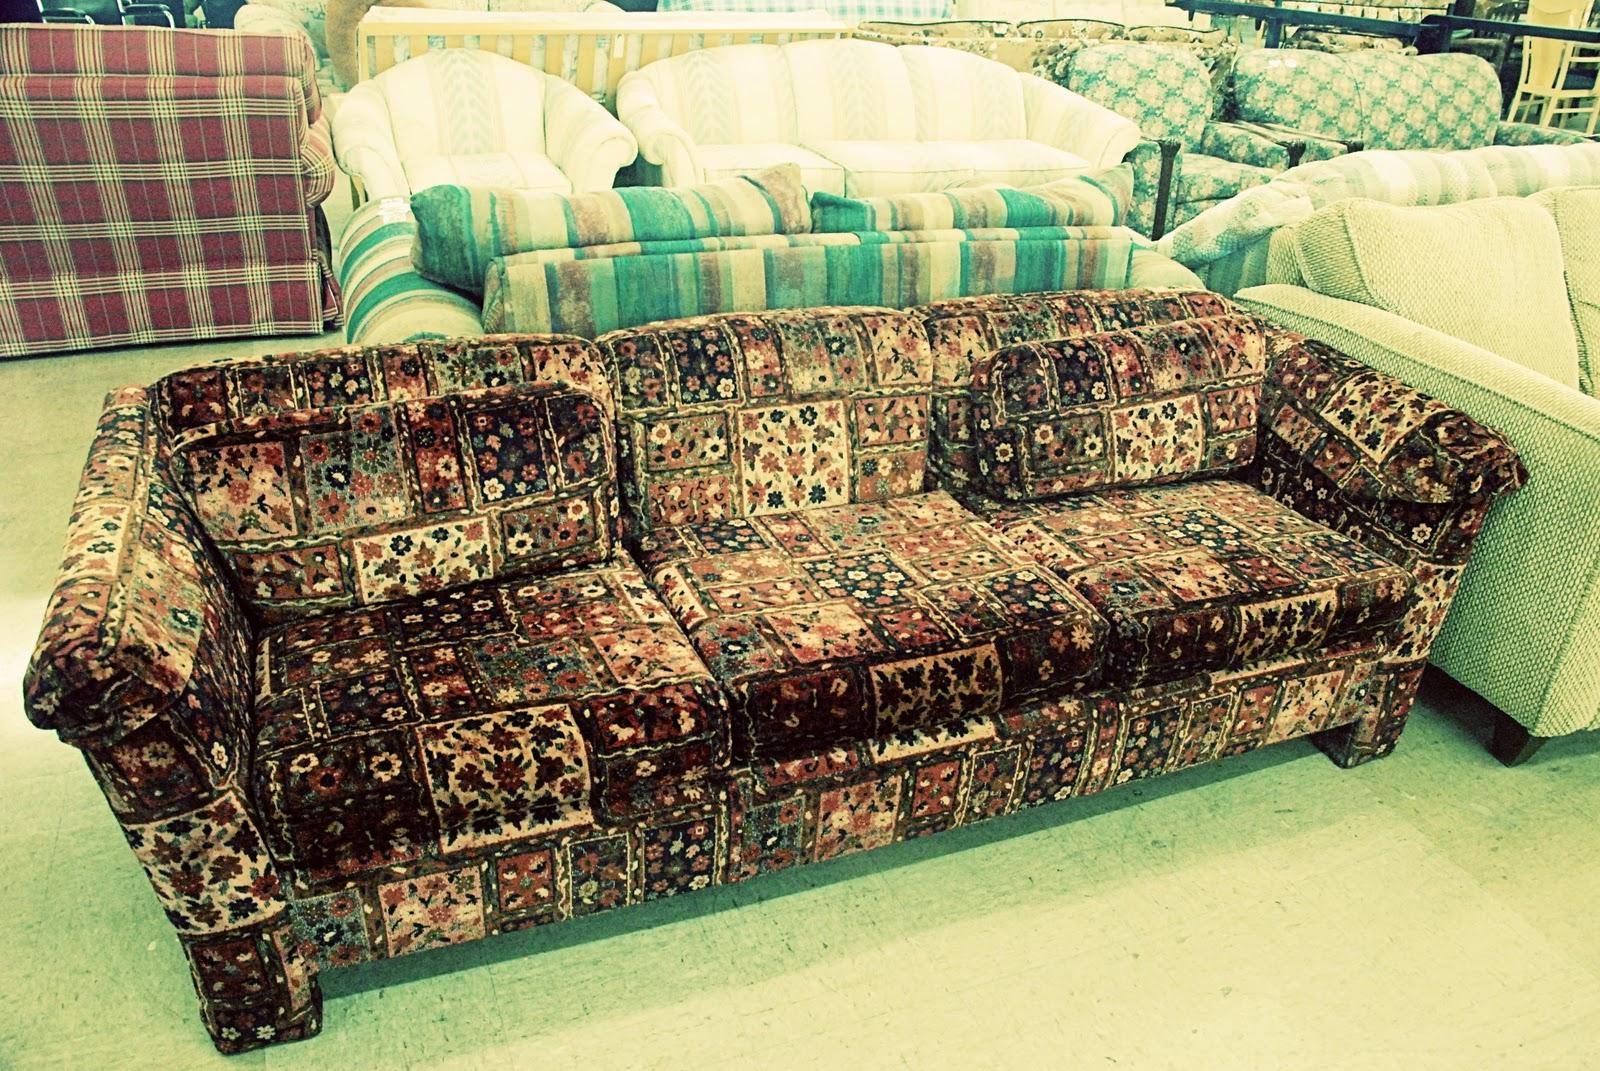 http://2.bp.blogspot.com/_RjVscSWW_oY/TUTkM2-HjWI/AAAAAAAAAgA/2KLs5NejBbw/s1600/gypsy+couch.jpg